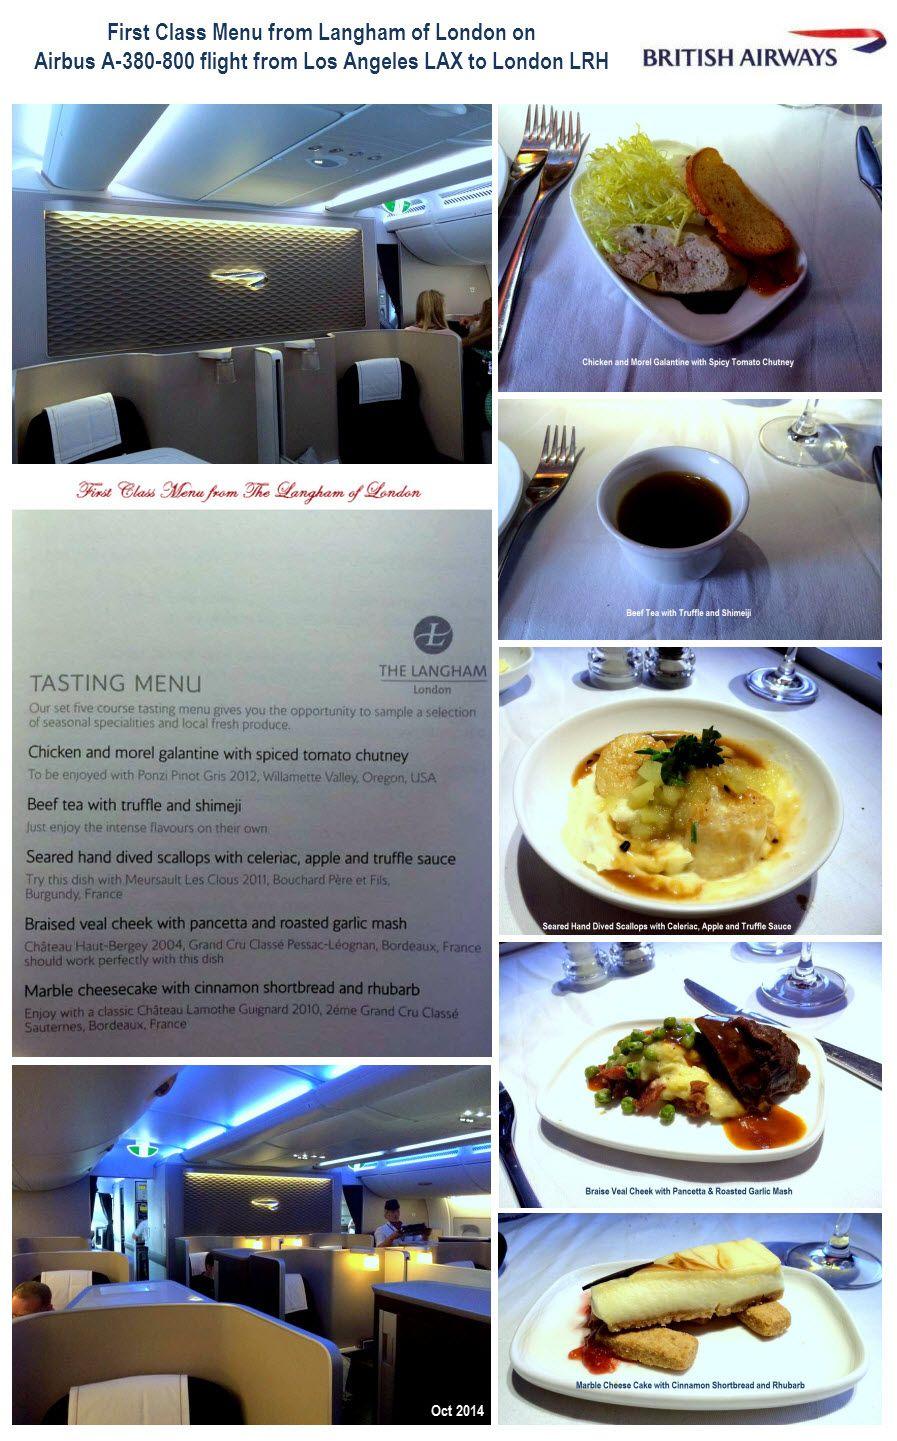 British airways first class menu from langham of london